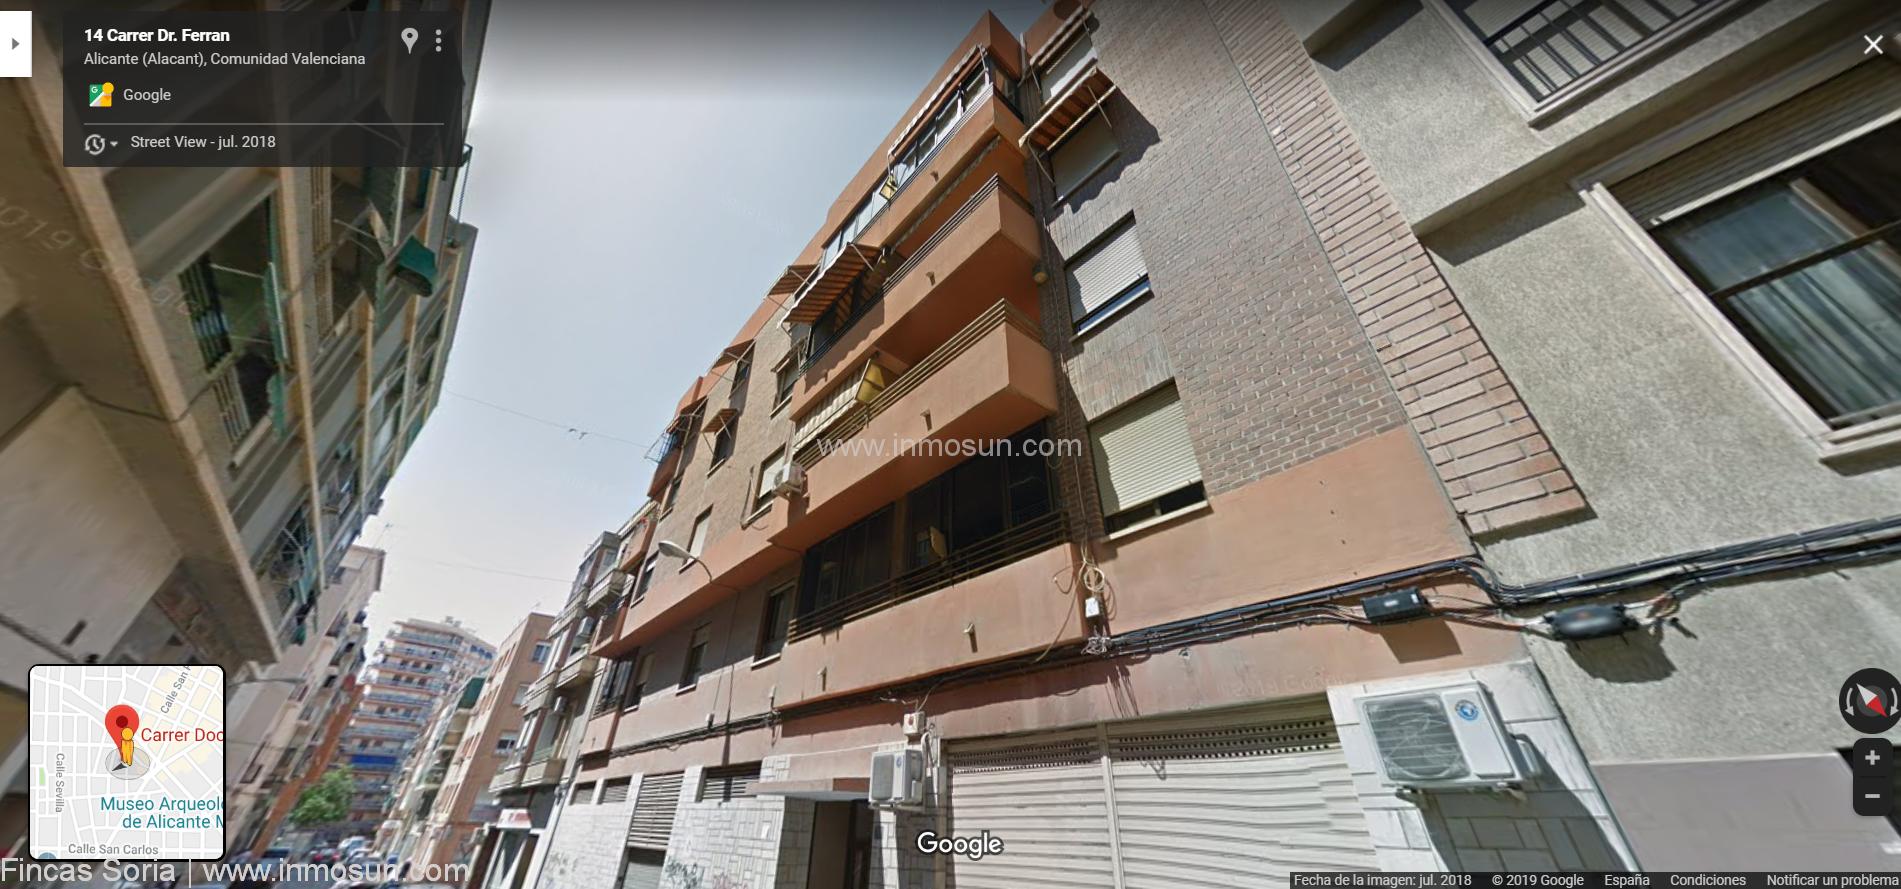 14 Carrer Dr  Ferran - Google Maps